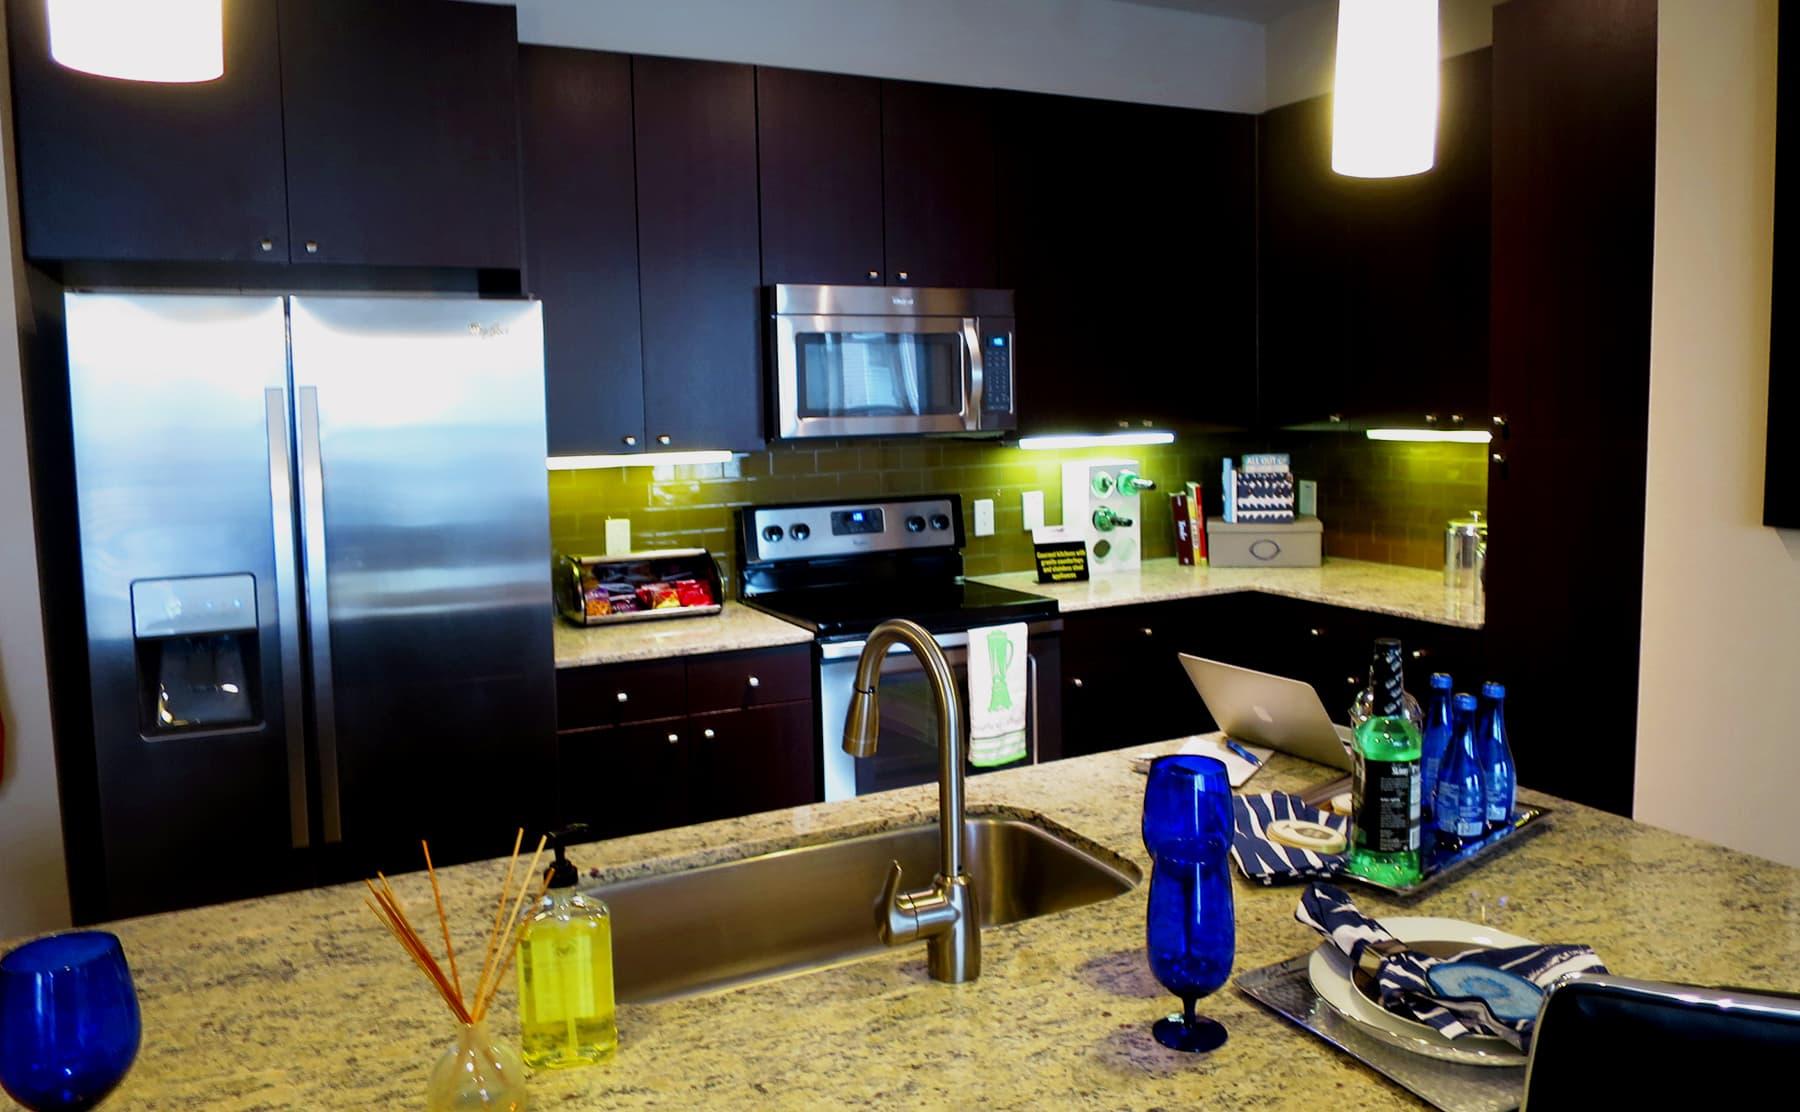 Apartments in Las Colinas - Irving with Granite or Quartz Countertops